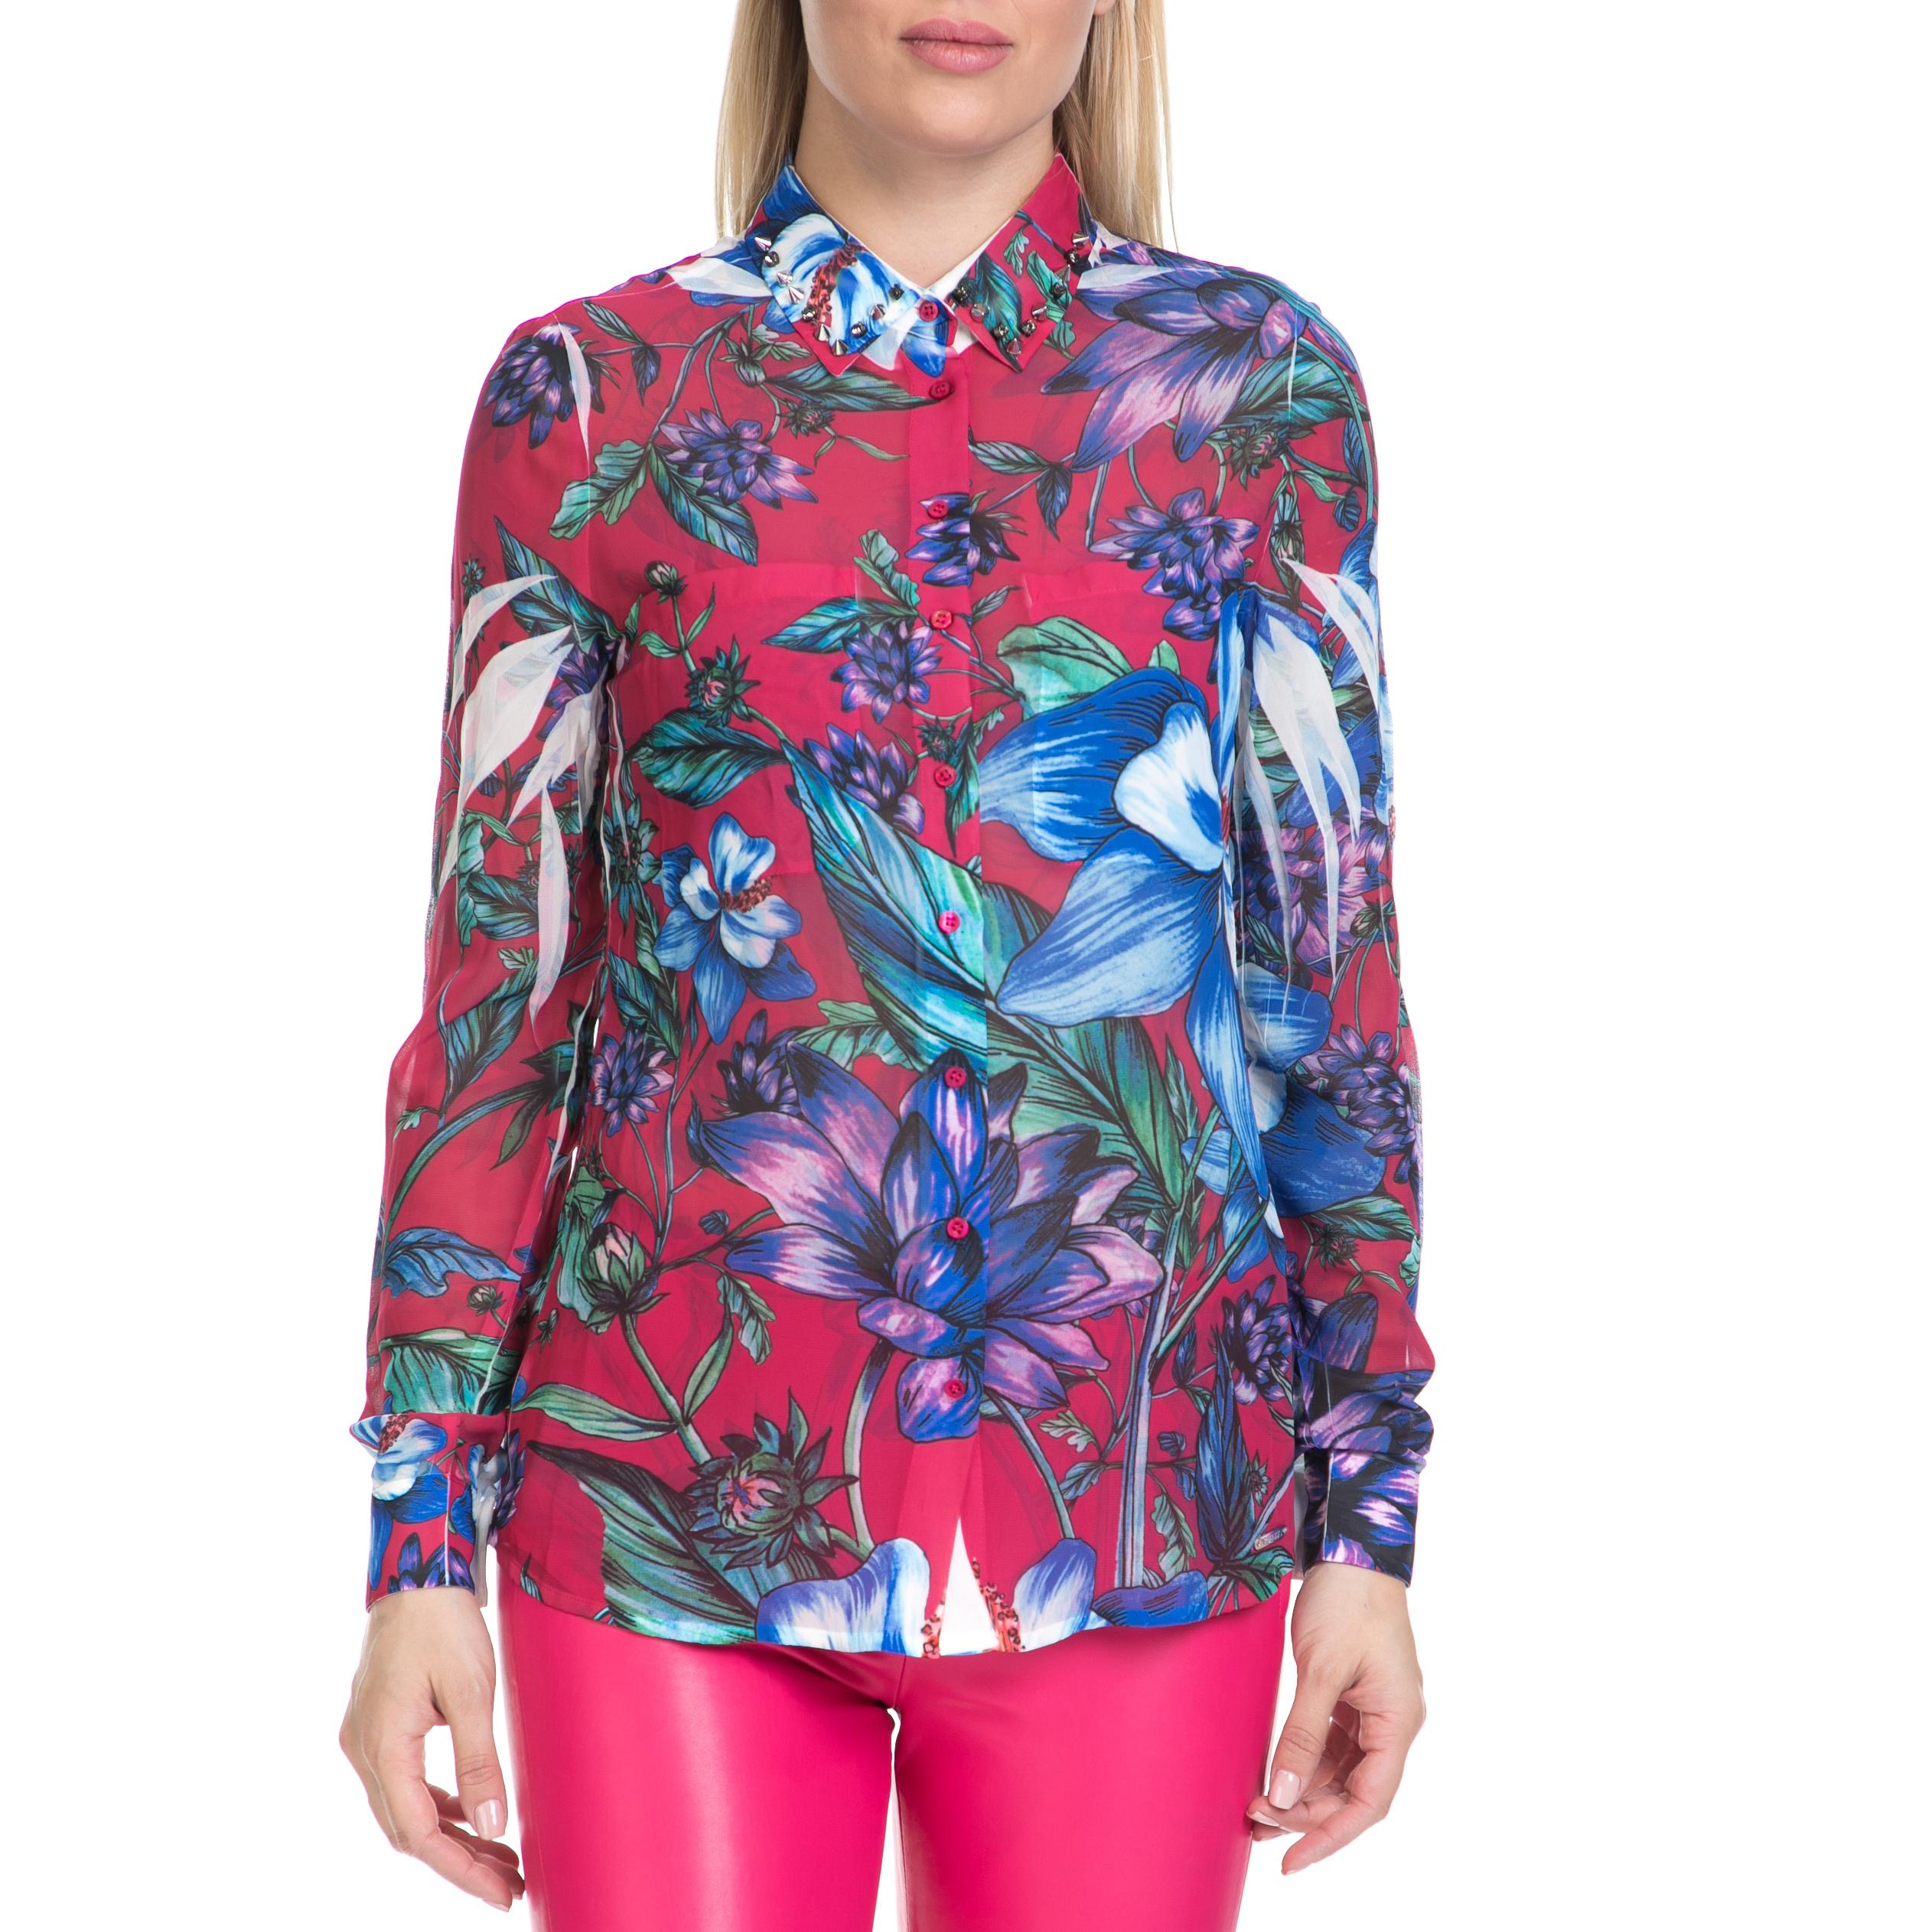 GUESS - Γυναικείο πουκάμισο CLOUIS GUESS ροζ-εμπριμέ γυναικεία ρούχα πουκάμισα μακρυμάνικα